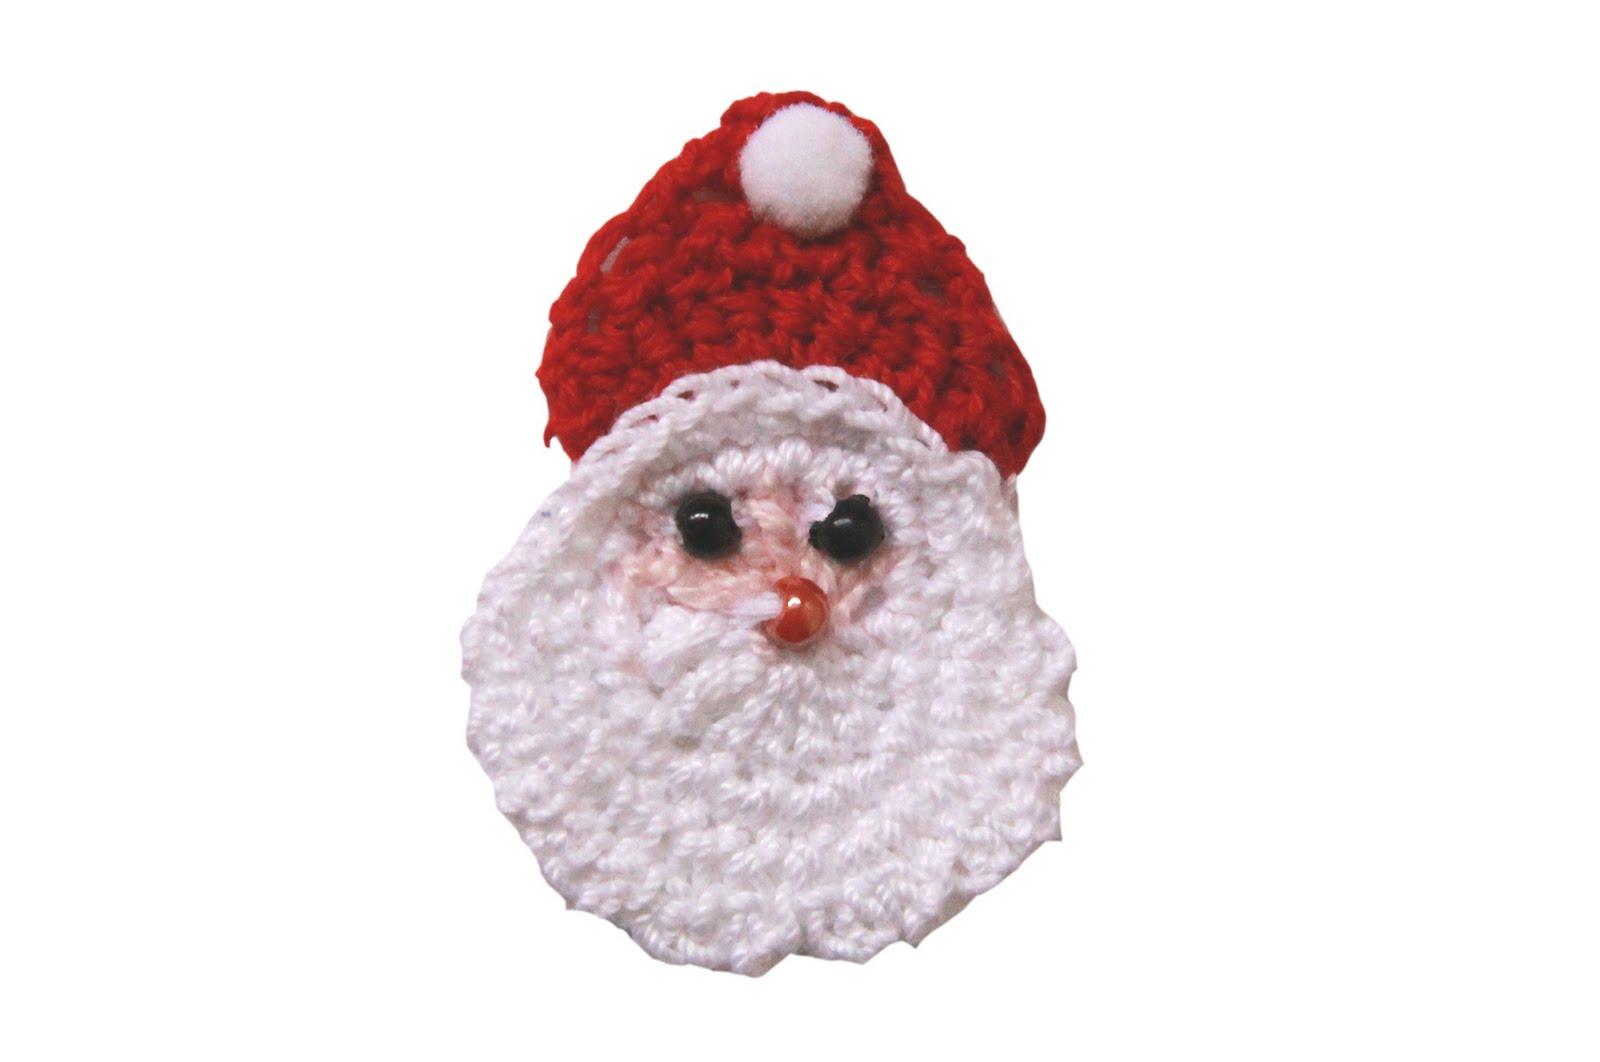 Crochet santa face wallskid crochet santa face pattern bankloansurffo Image collections